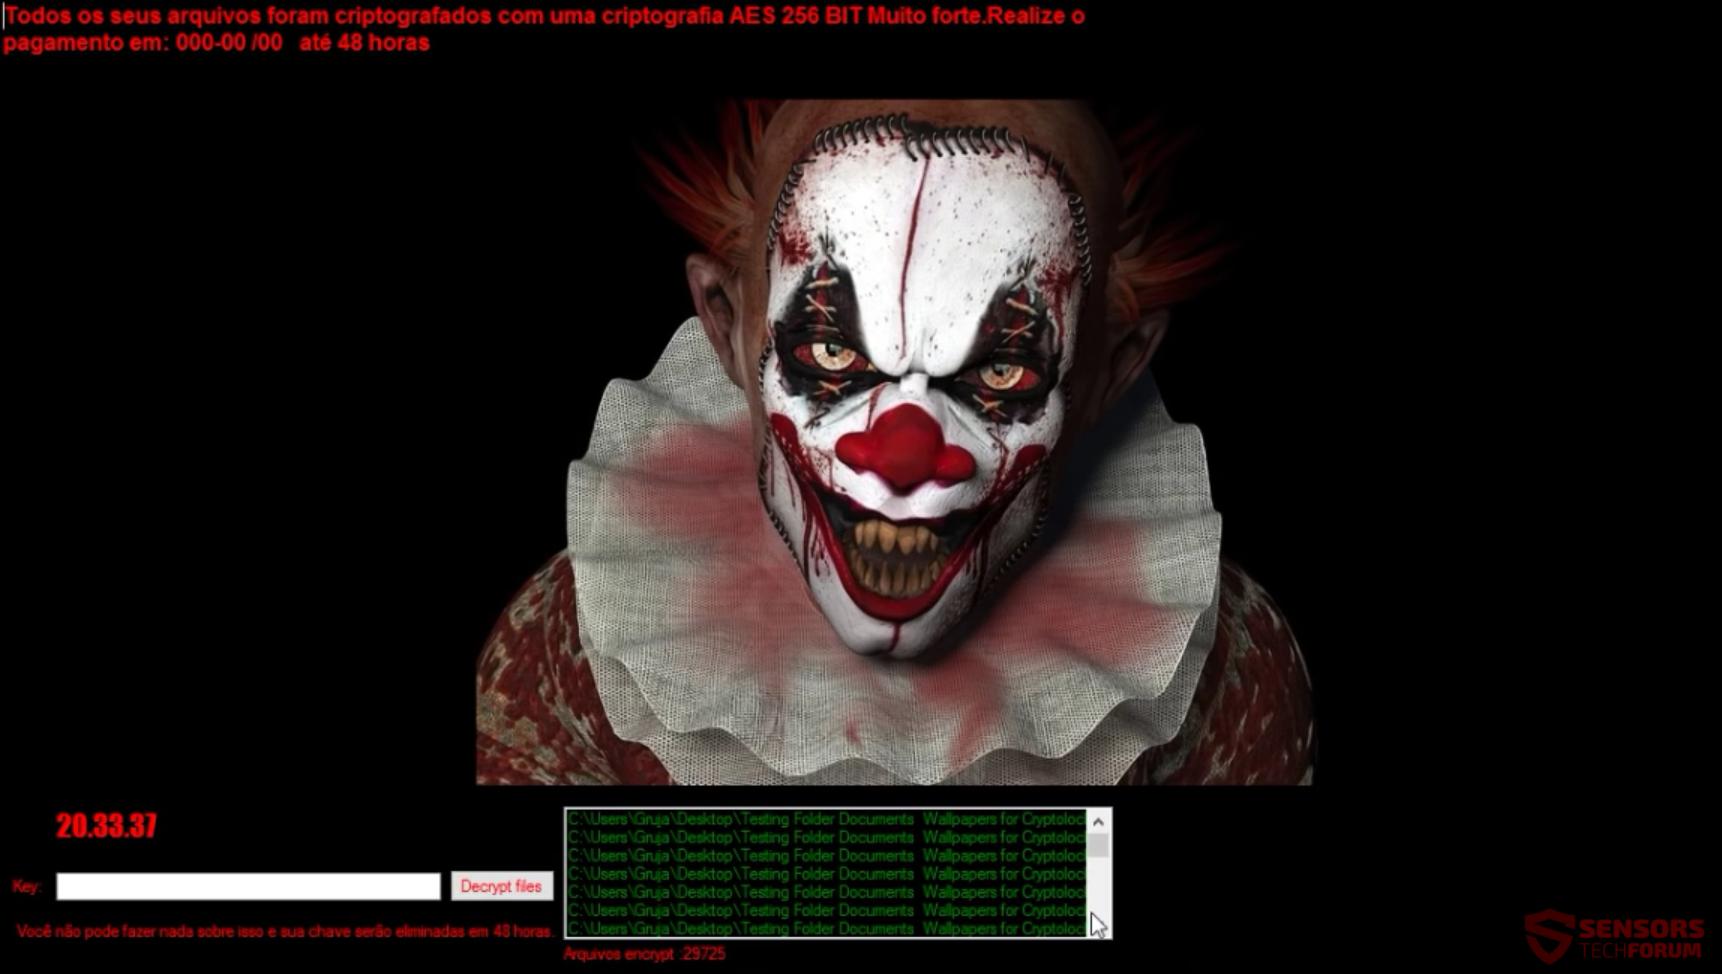 stf-killerlocker-ransomware-killer-locker-crypto-virus-ransom-desktop-screen-clown-timer